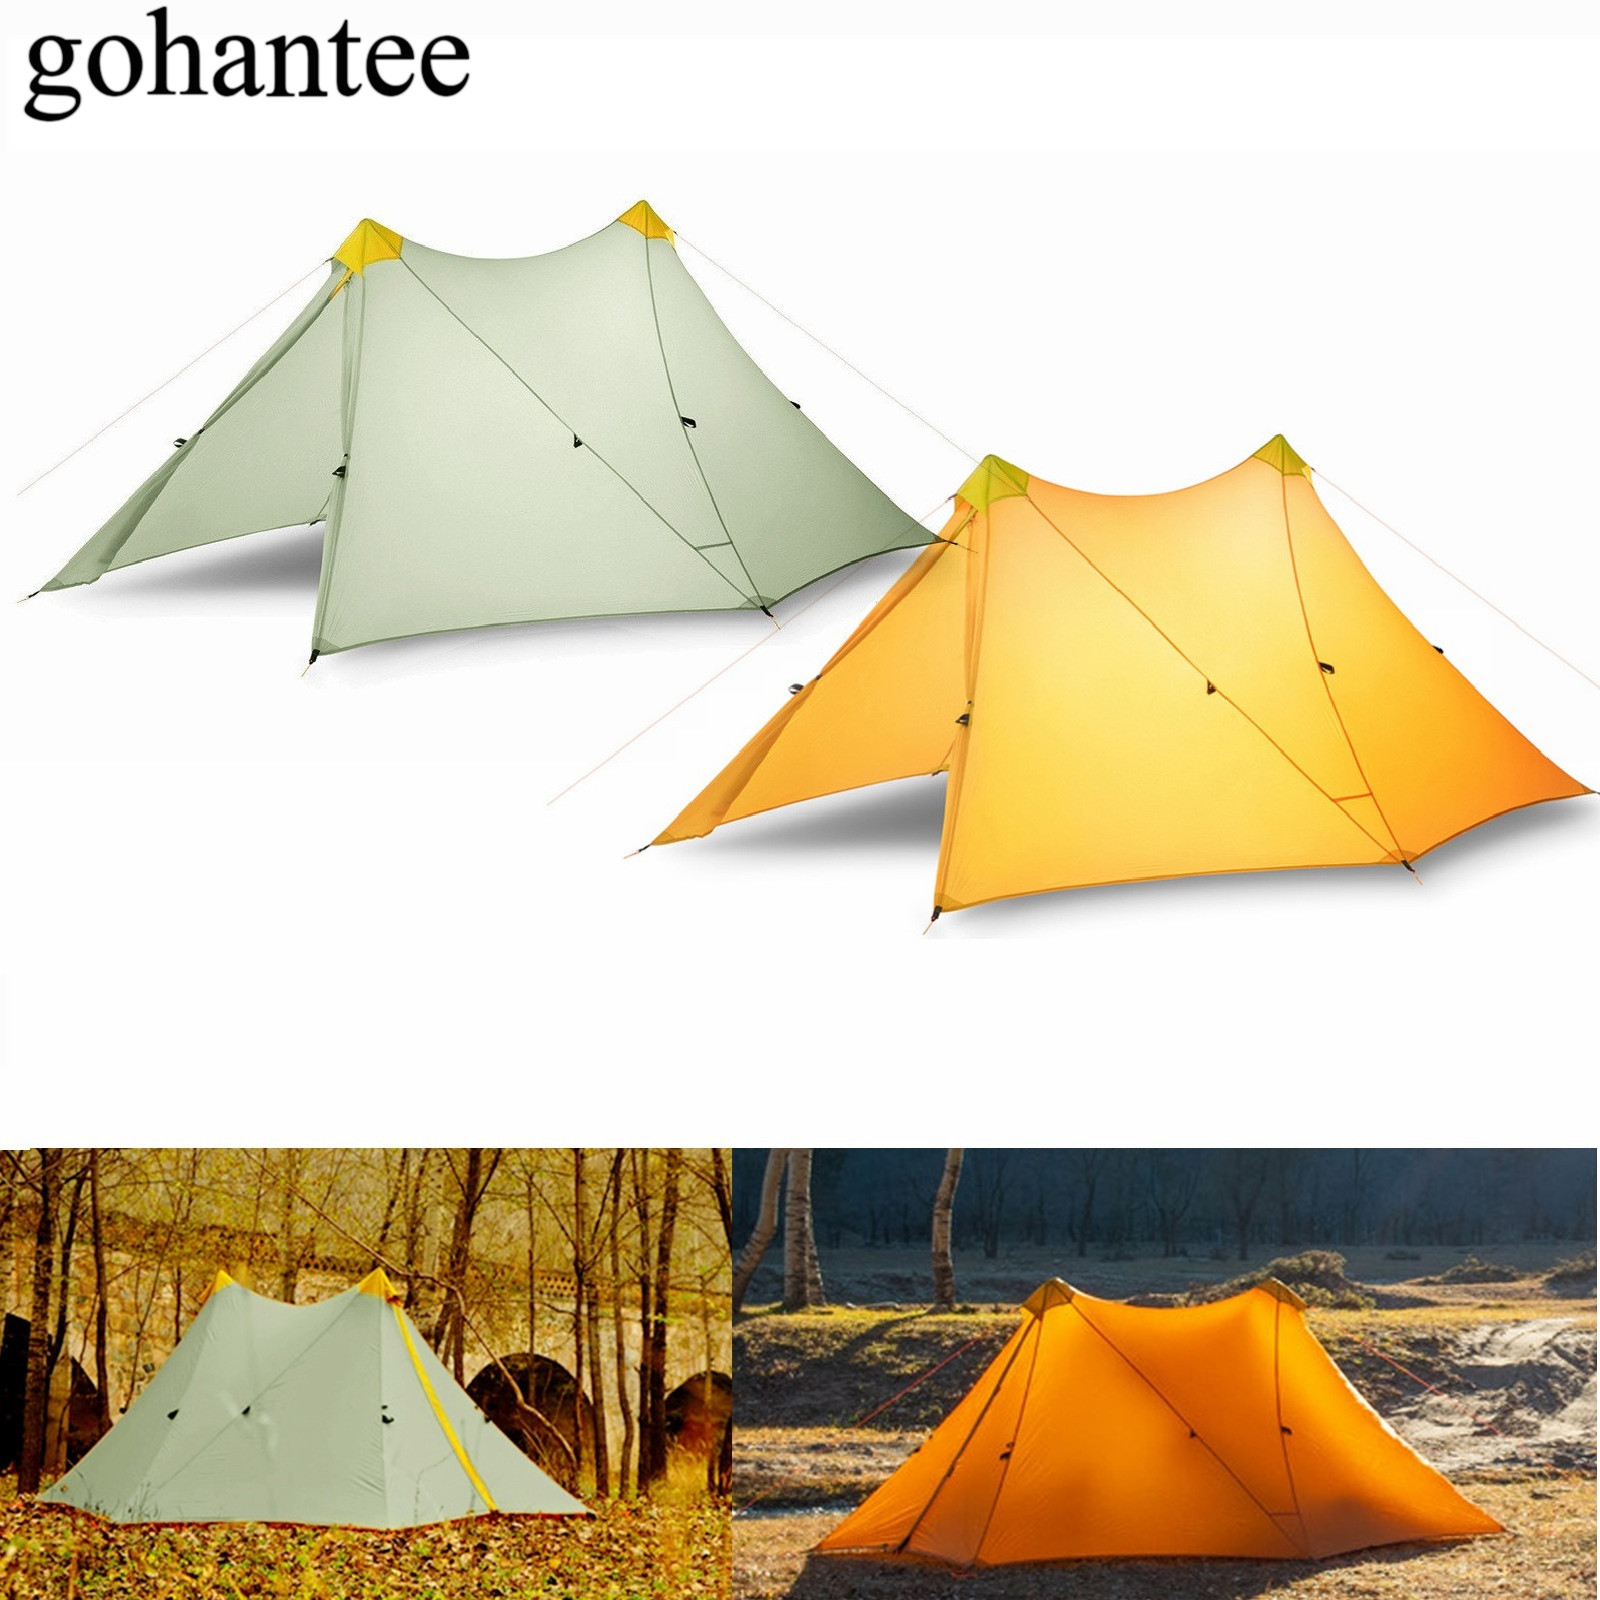 570G UL Ultraleicht Camping Zelt 1-2 Person Outdoor 20D Nylon Sowohl Seiten Silicon Beschichtung Kolbenstangenlosen Doppel Turm große Zelt 4 Saison